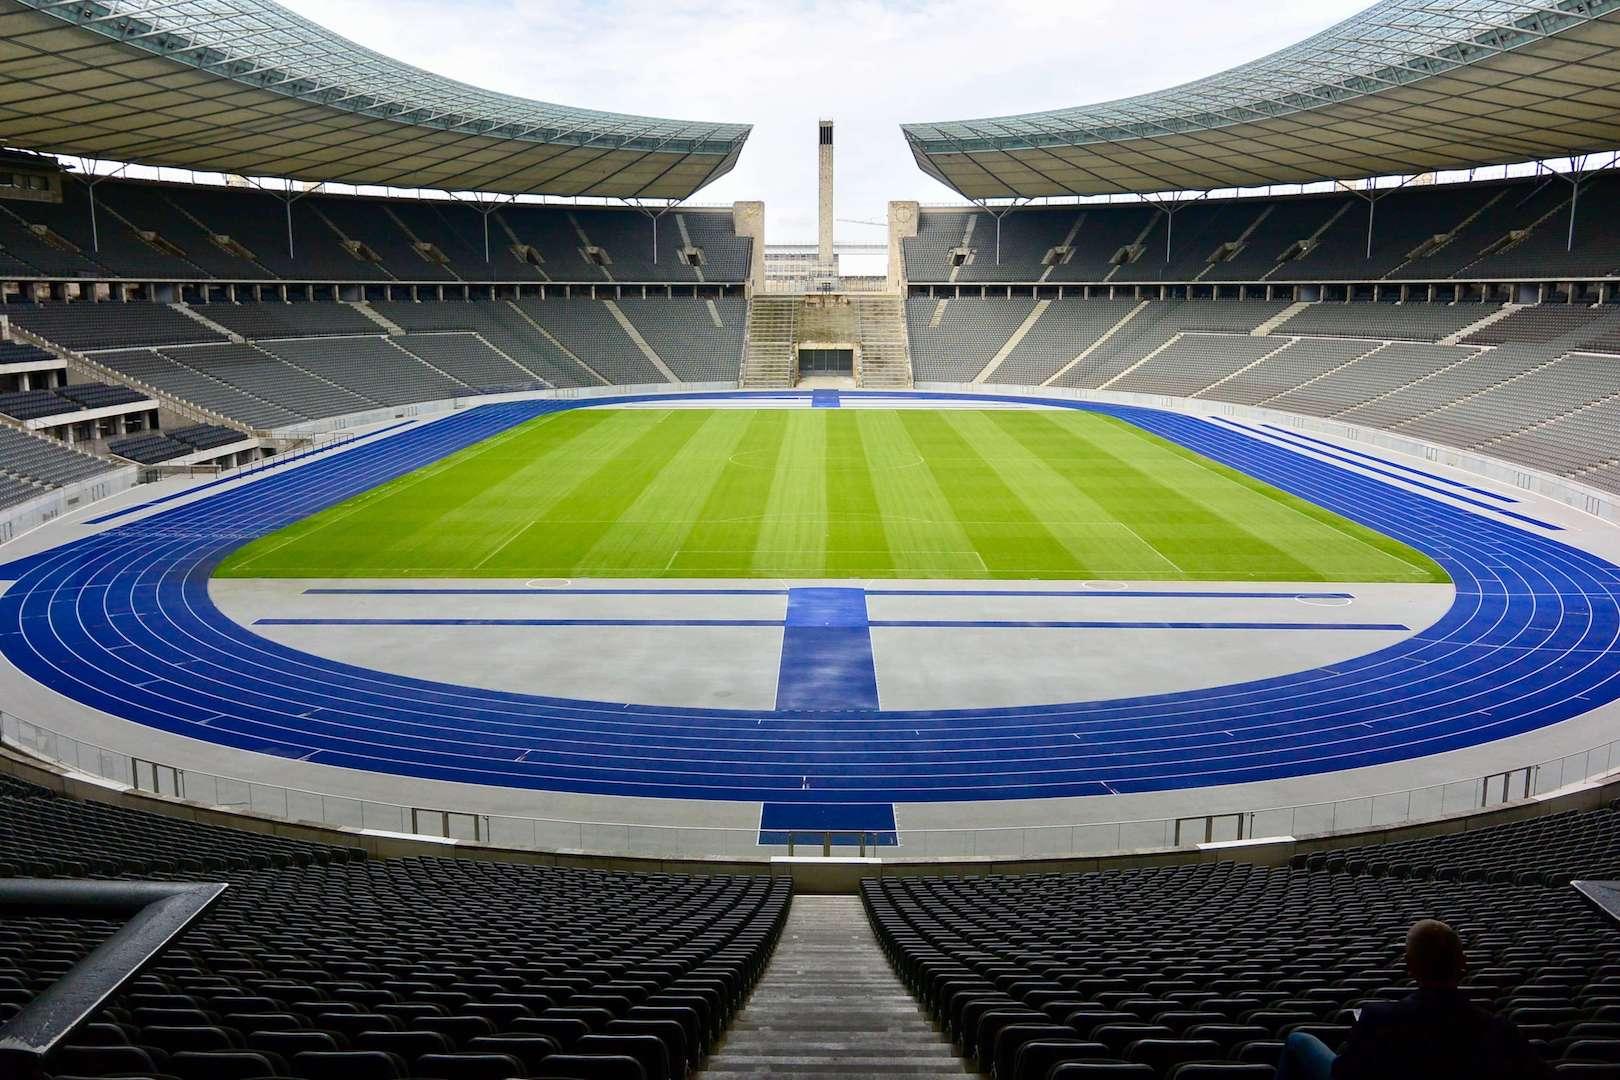 Germany, Berlin - The Olympiastadion